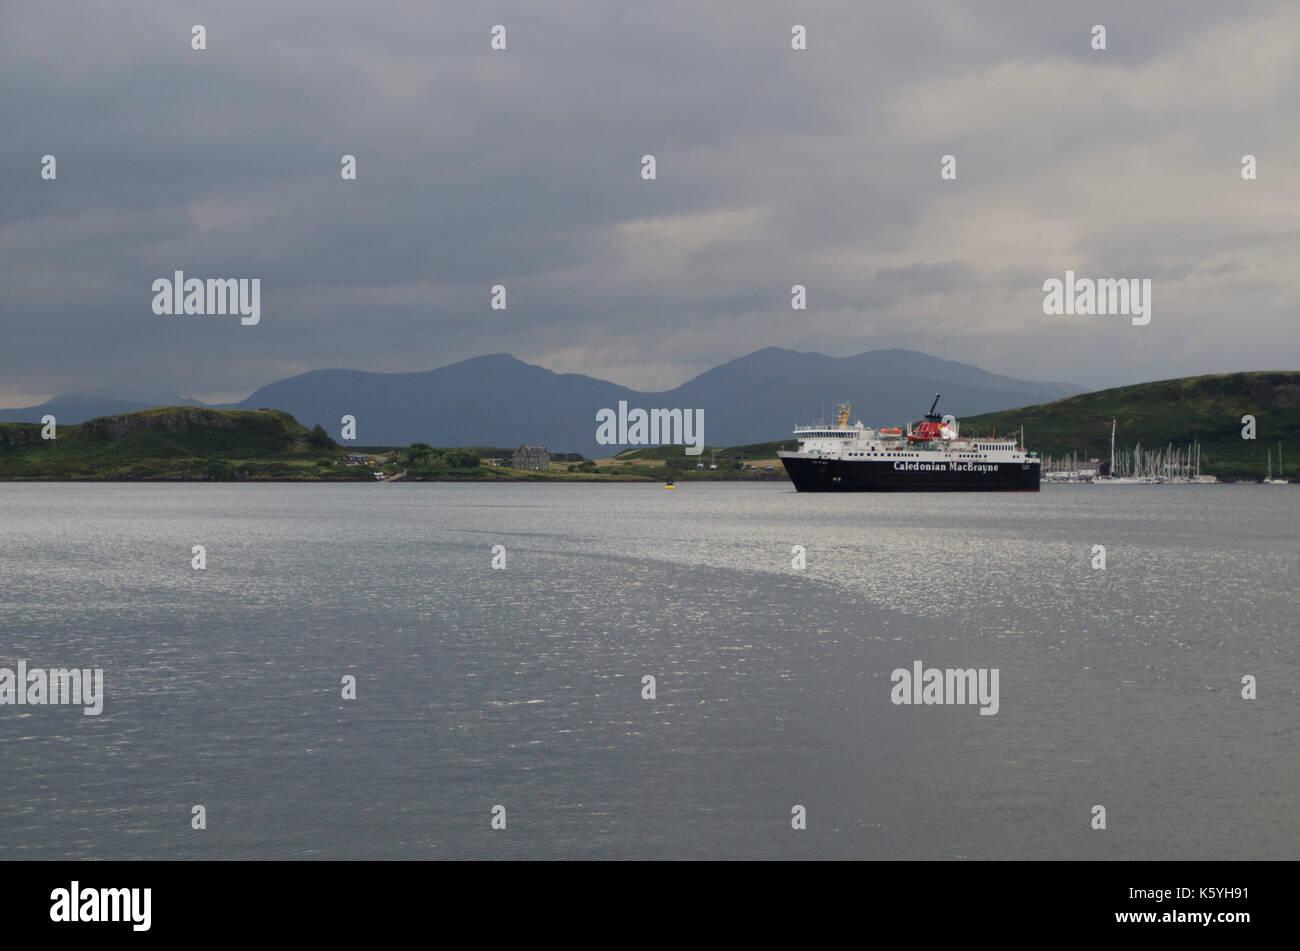 Cal Mac Ferry 'Isle of Mull' at Craignure - Stock Image